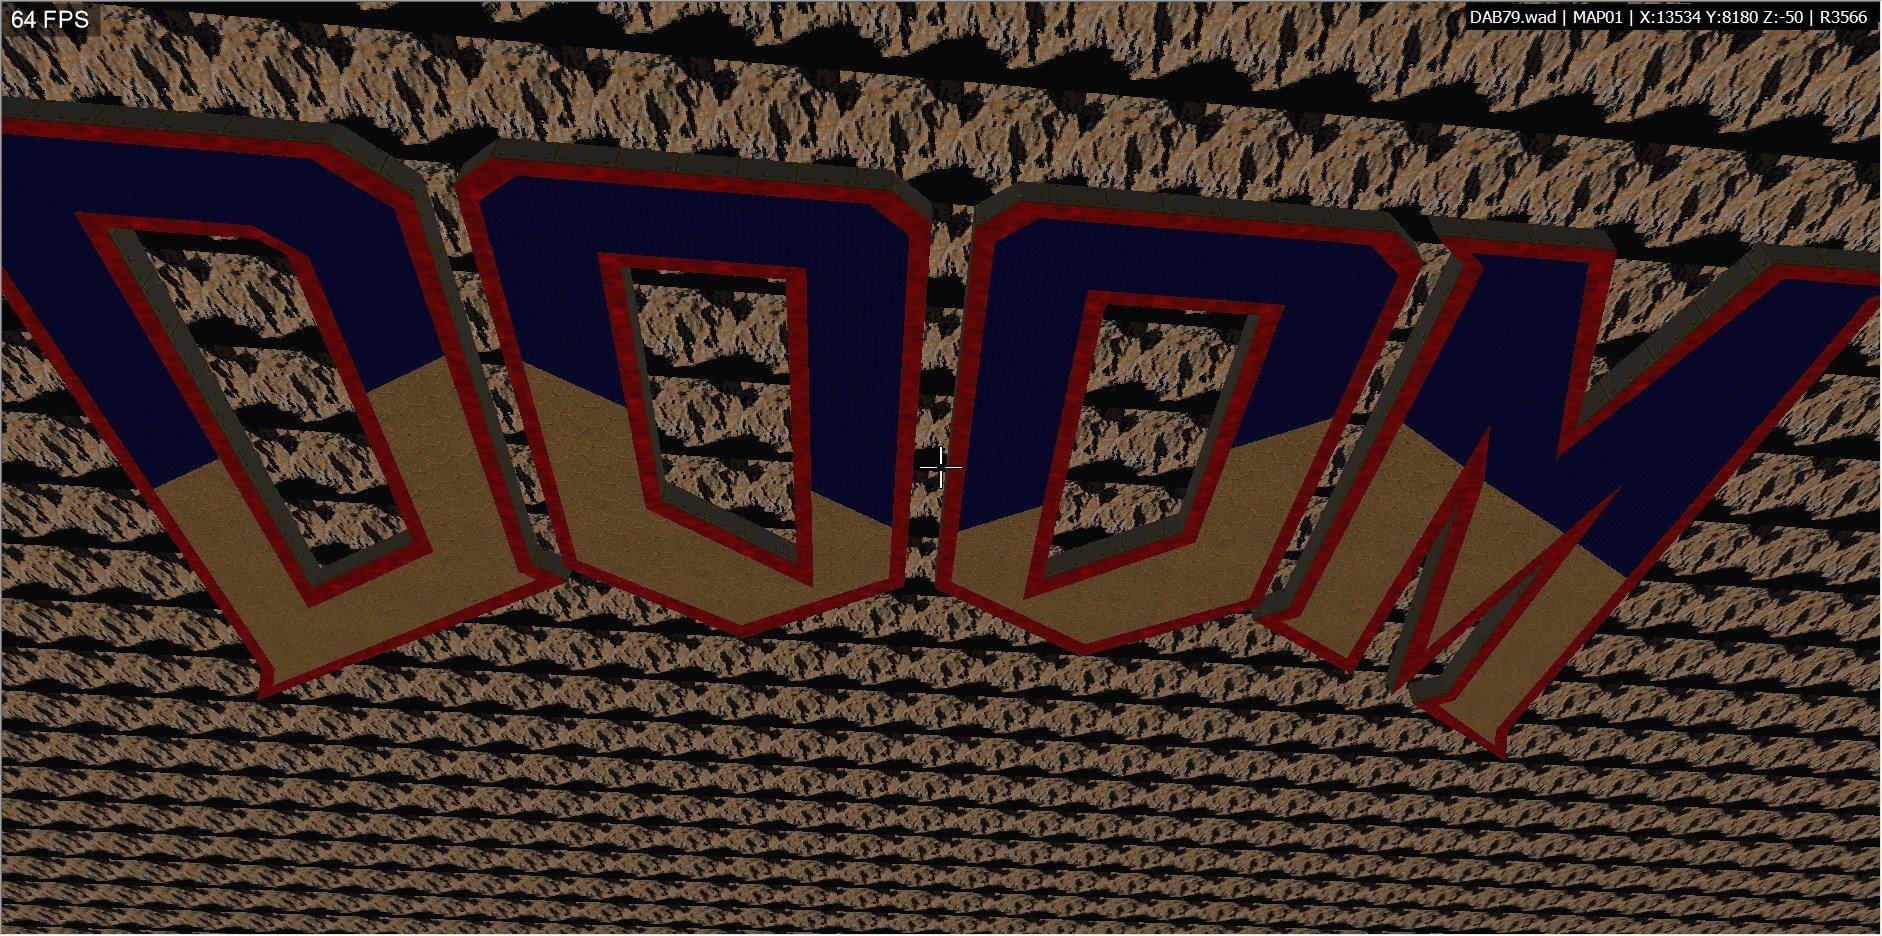 DAB79 (edit area) at 2020.09.19 22-50-29.698 [R3566].jpg